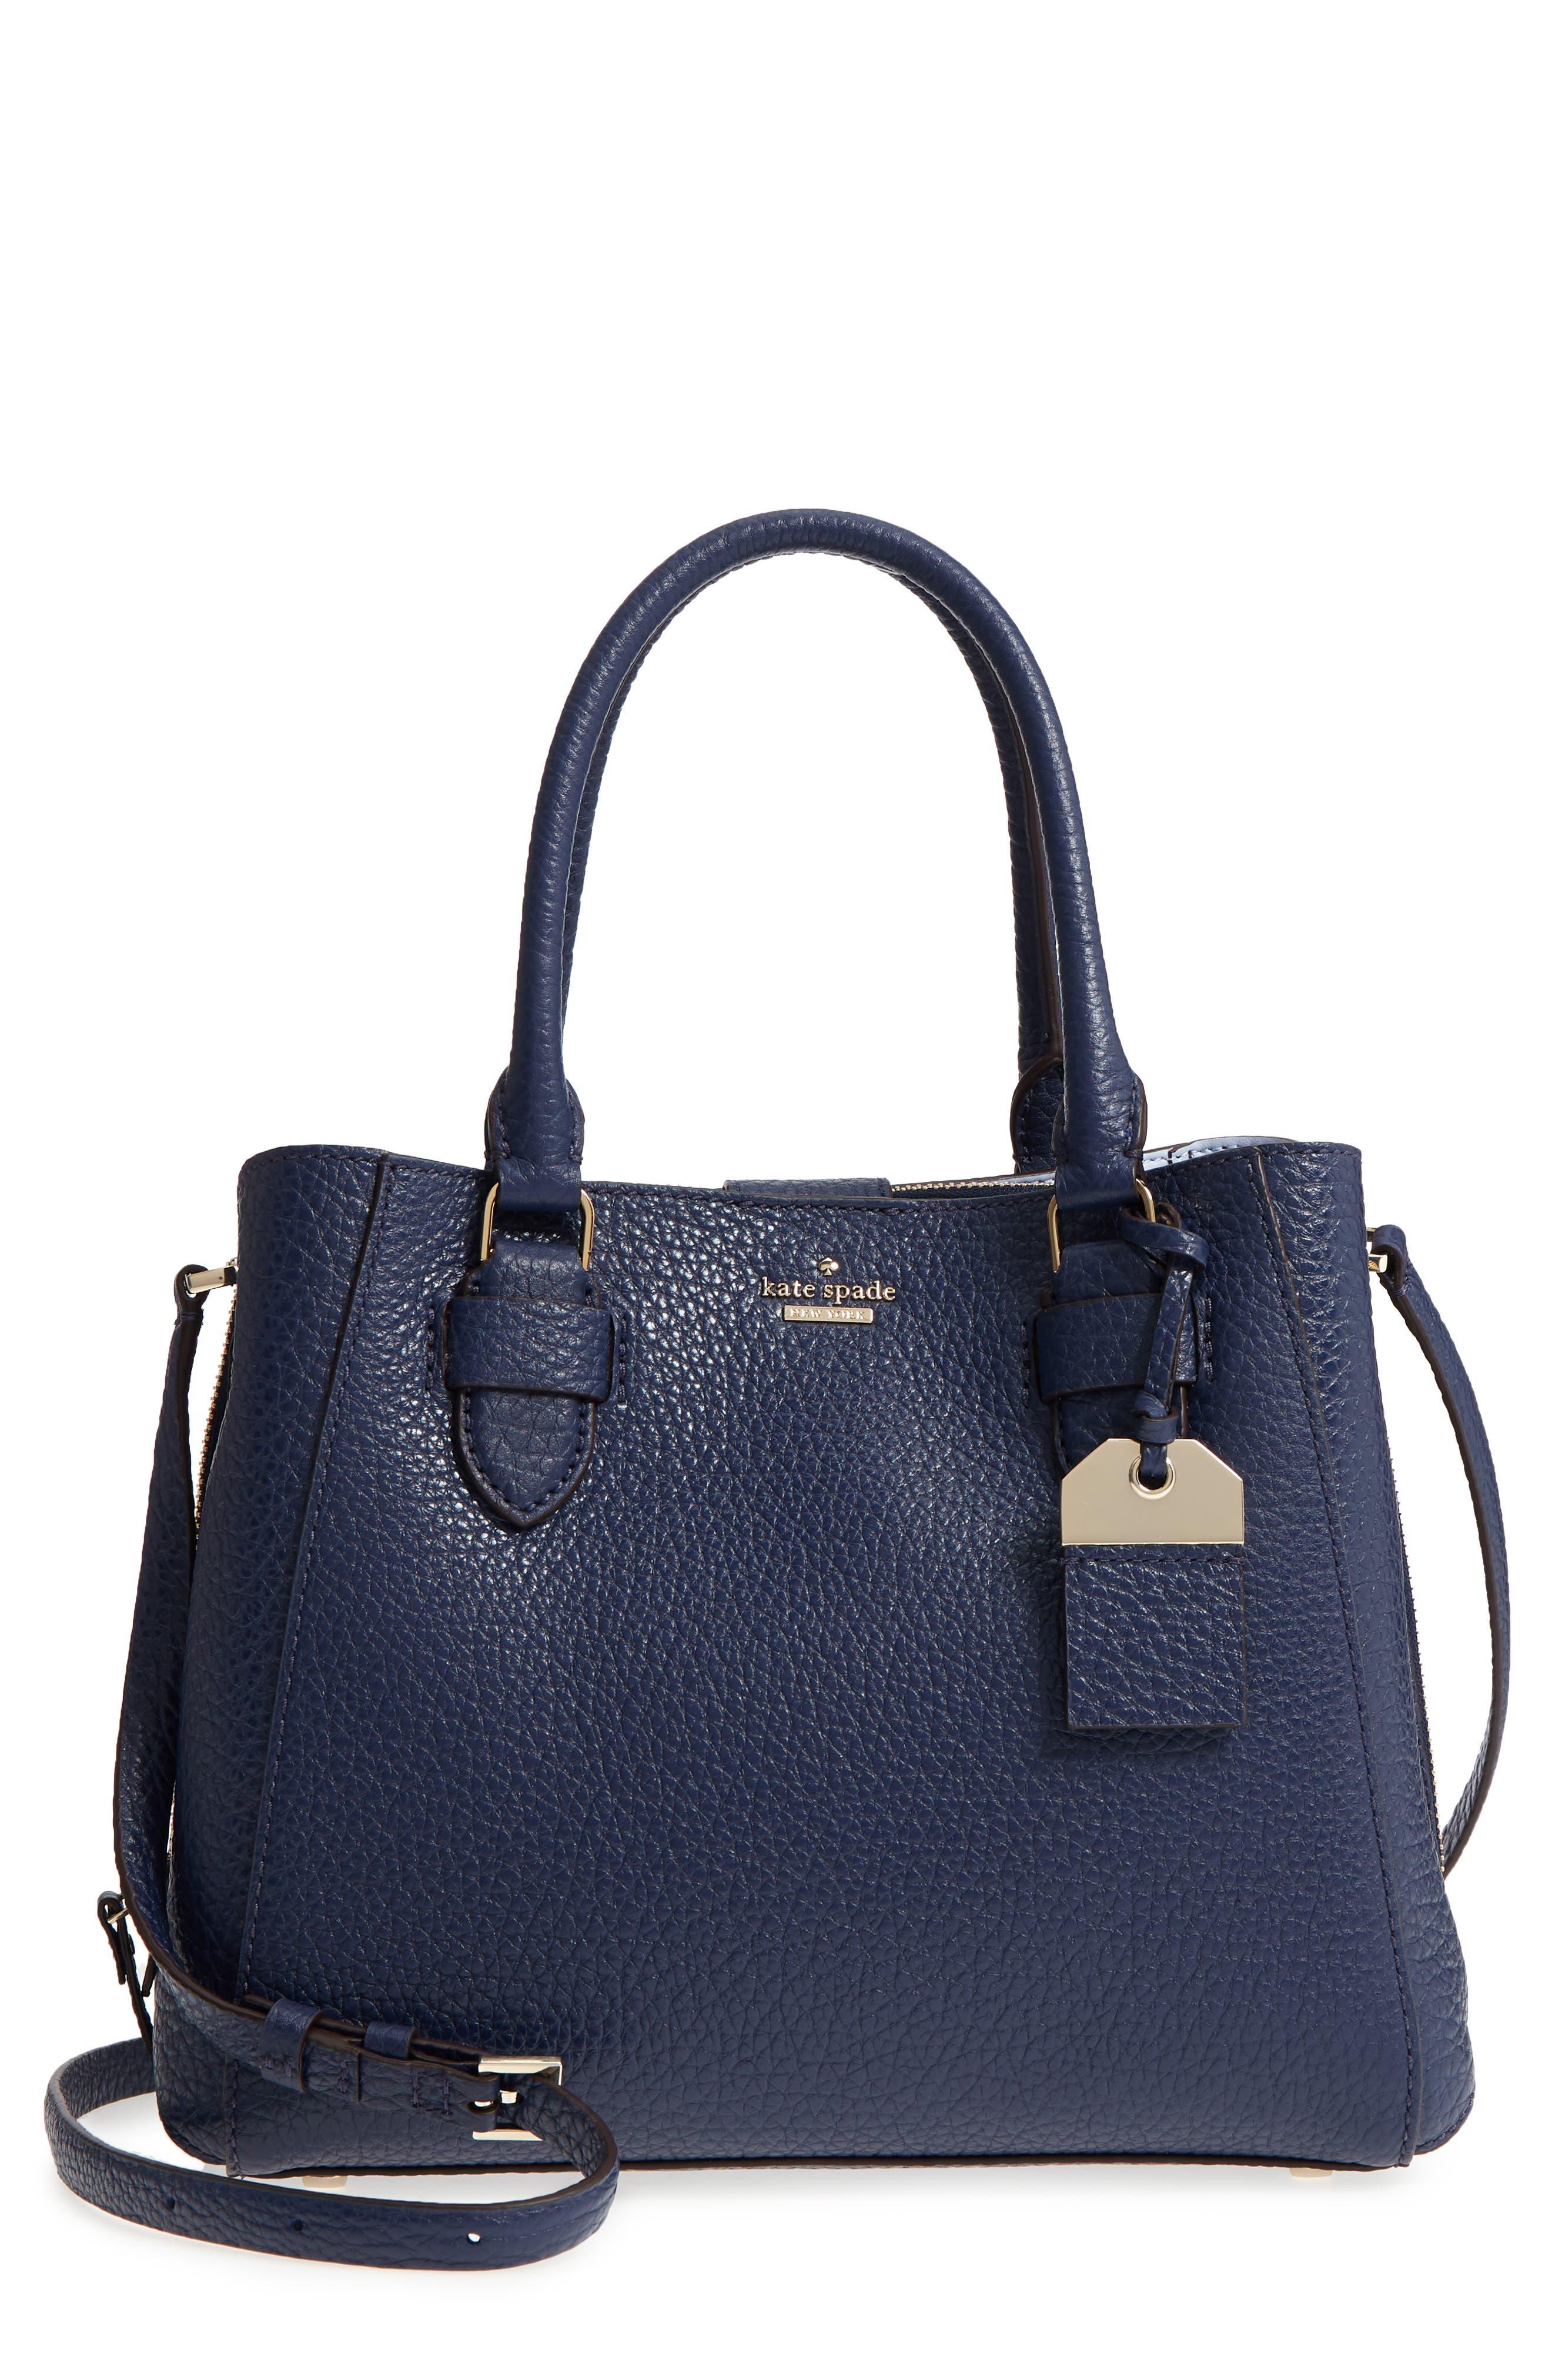 kate spade new york carter street - aliana leather satchel